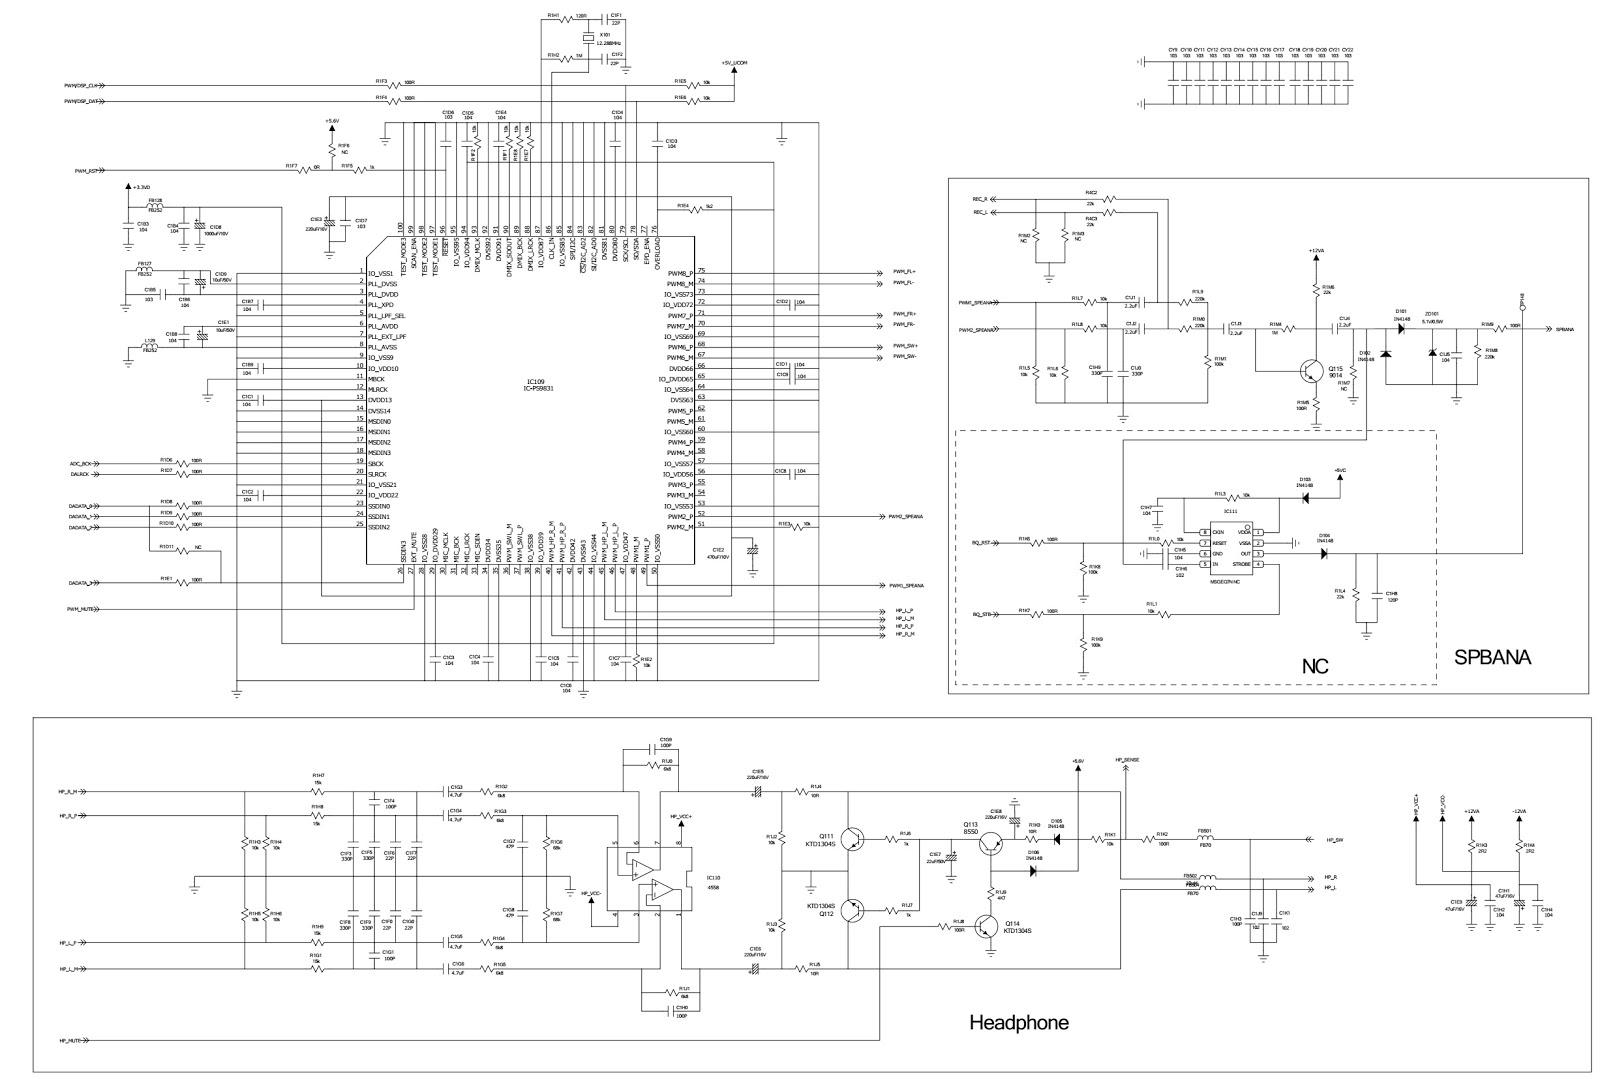 lg dm5620k dm5620k dms5620v w karaoke dvd mini hi fi system smps circuit diagram [ 1600 x 1079 Pixel ]